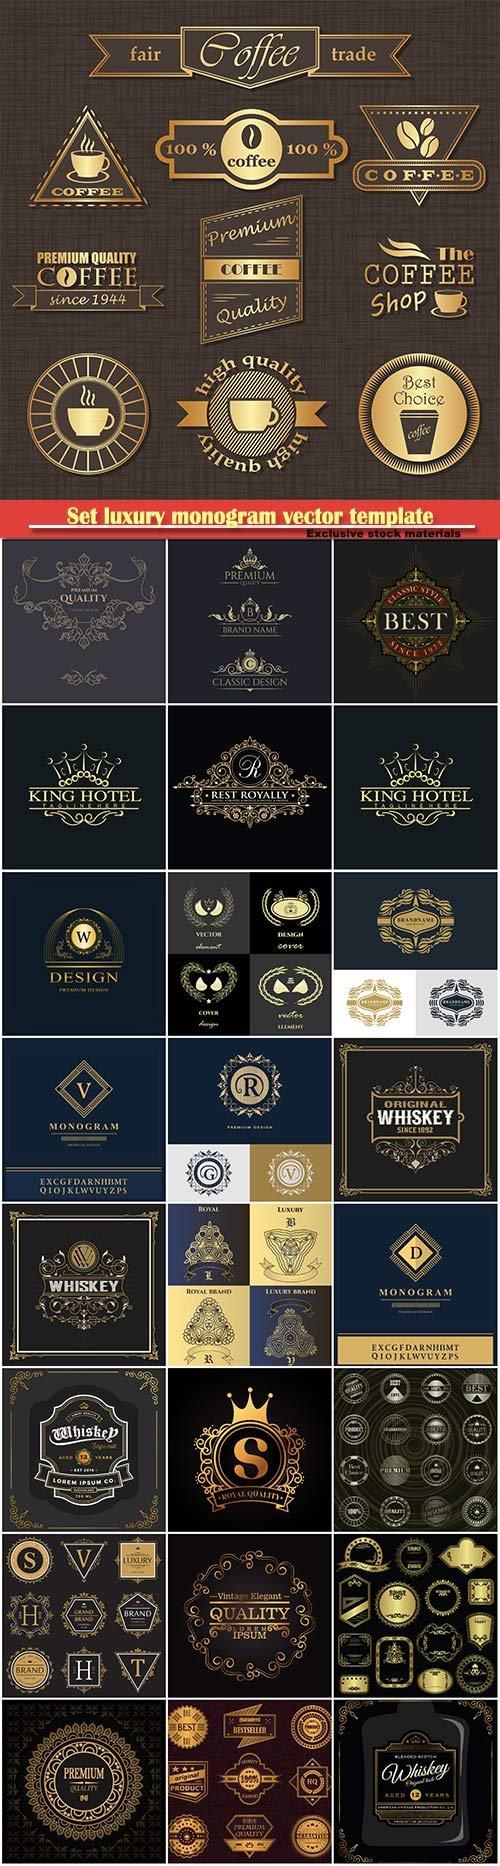 Set luxury monogram vector template, logos, badges, symbols # 7